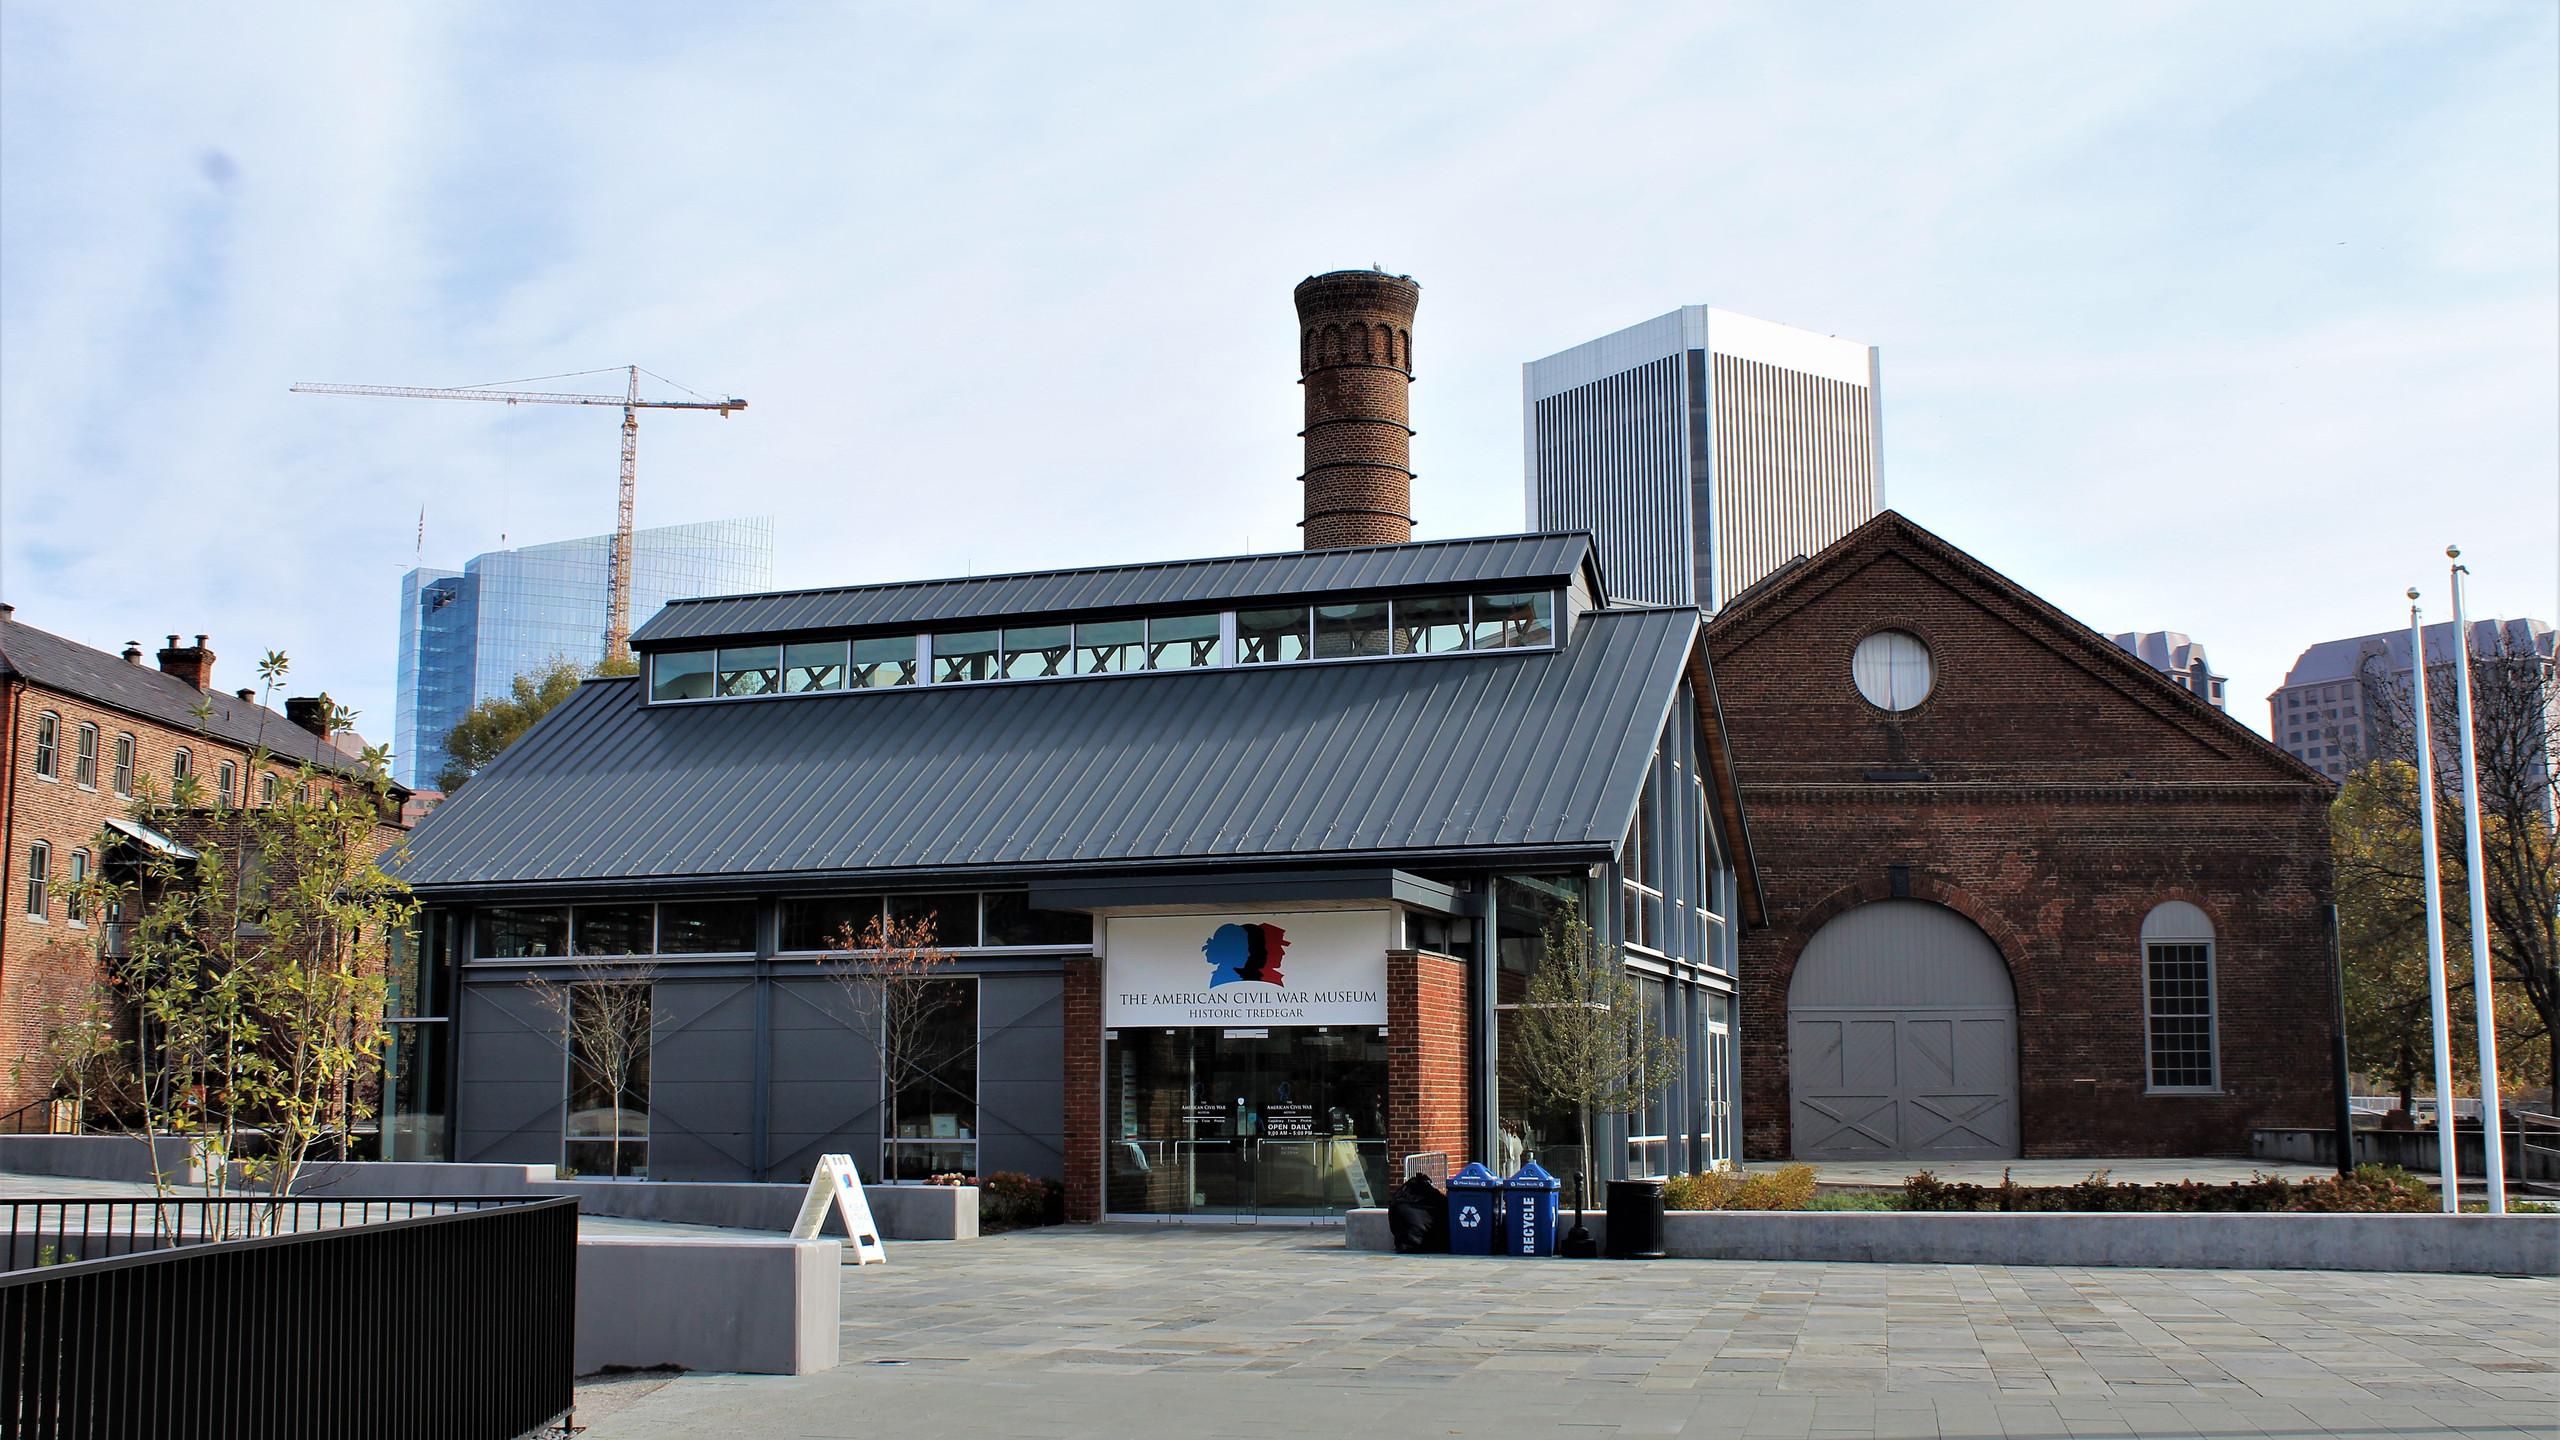 American Civil War Center Museum